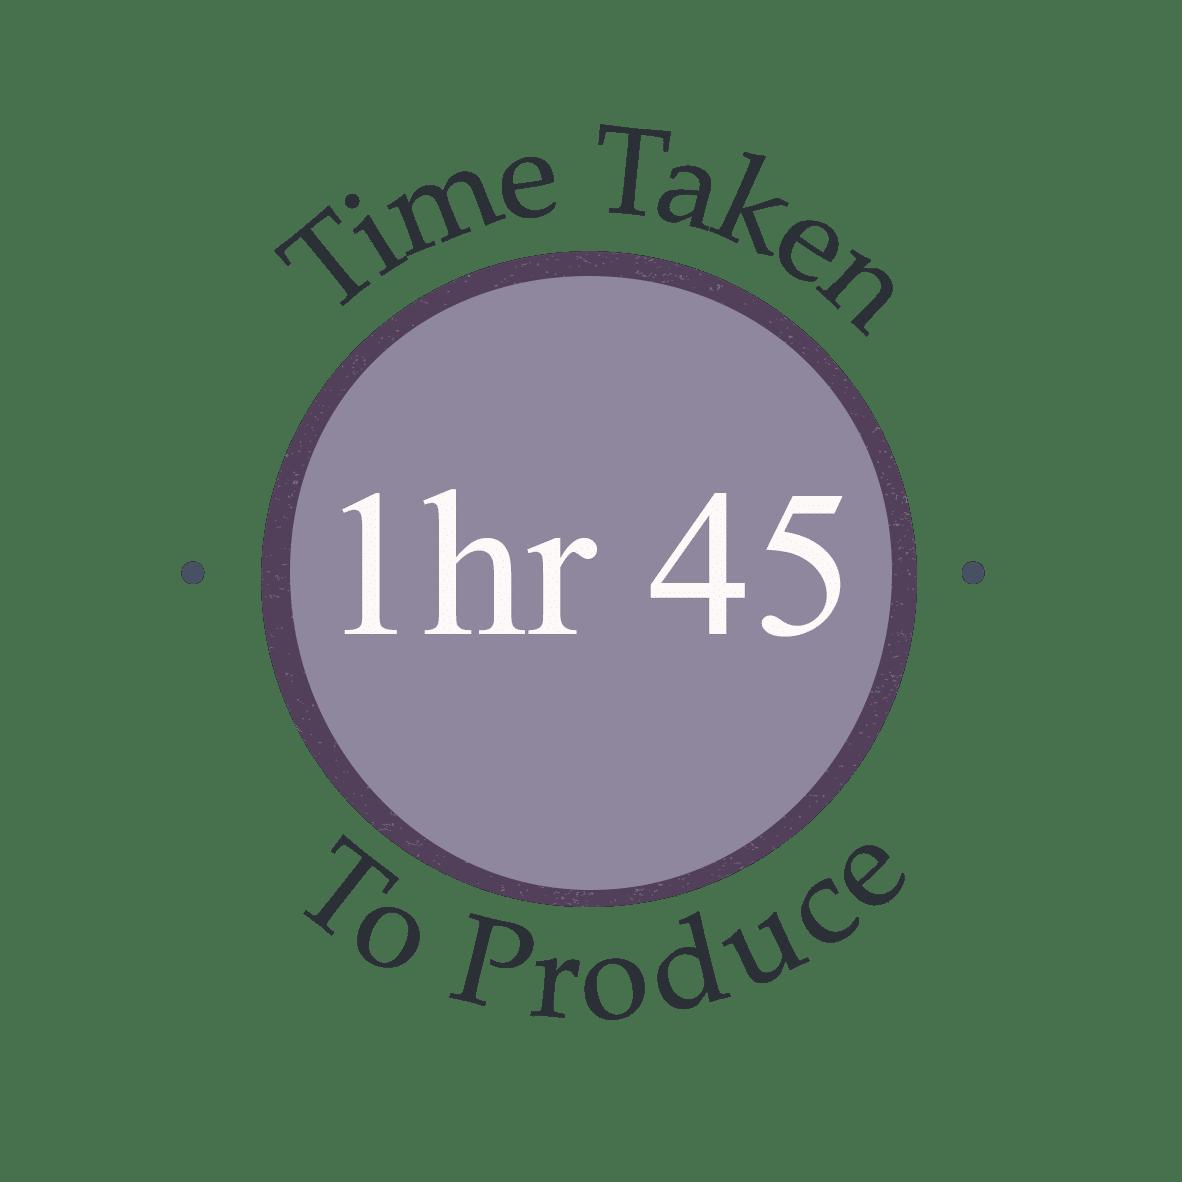 1 hour 45 minutes to make recipe